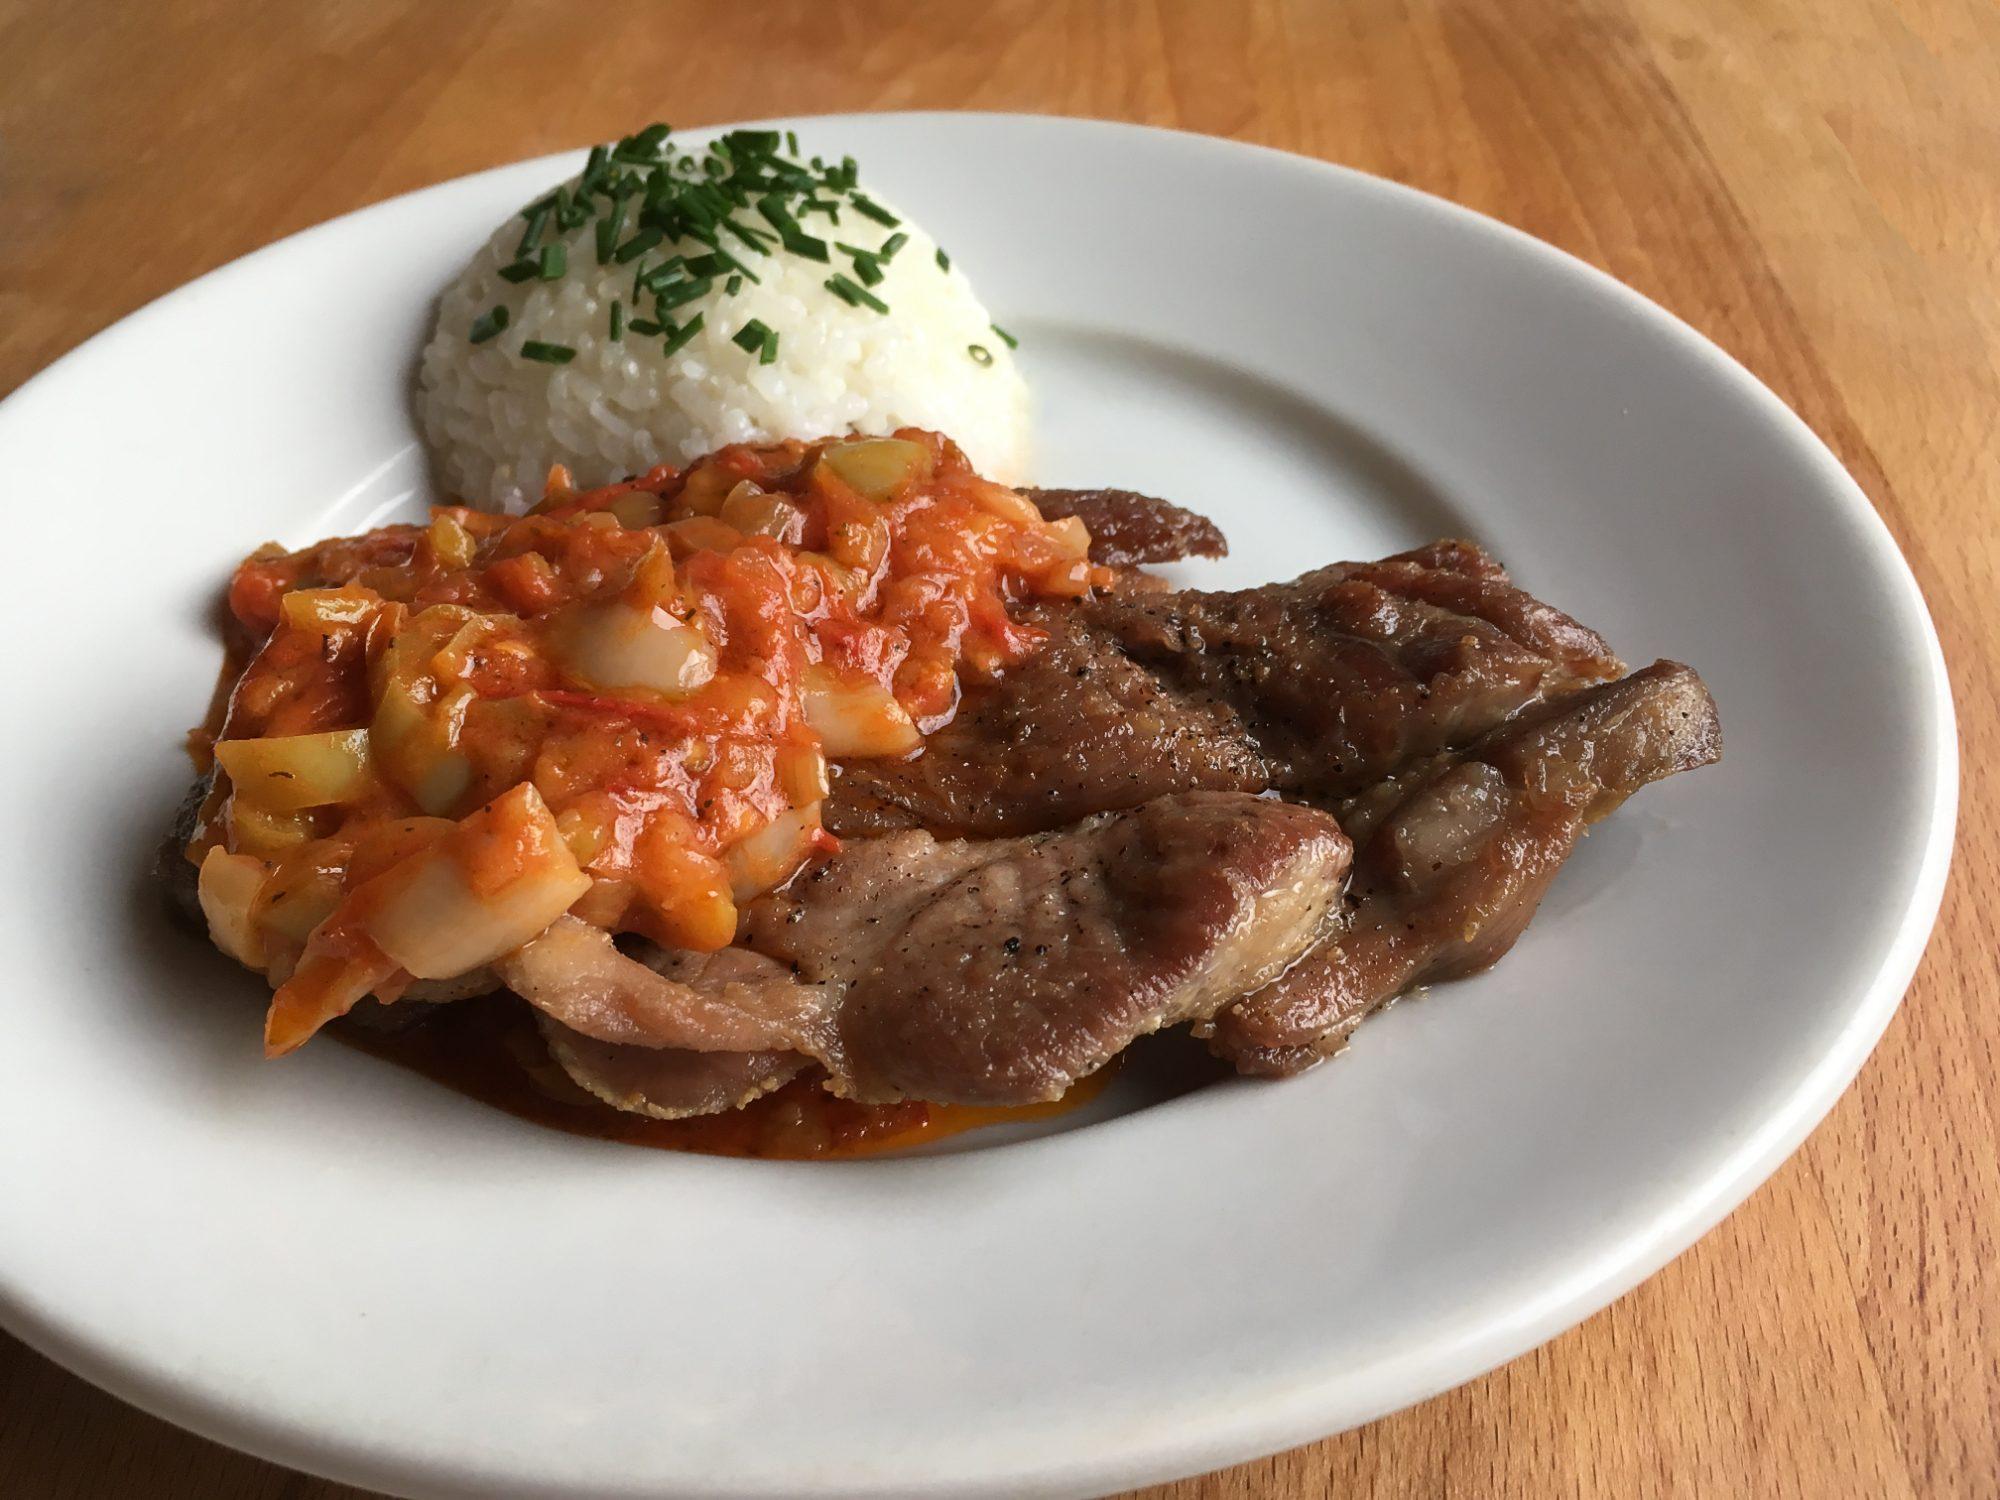 Srbské bravčové rebierko s paradajkami a paprikami